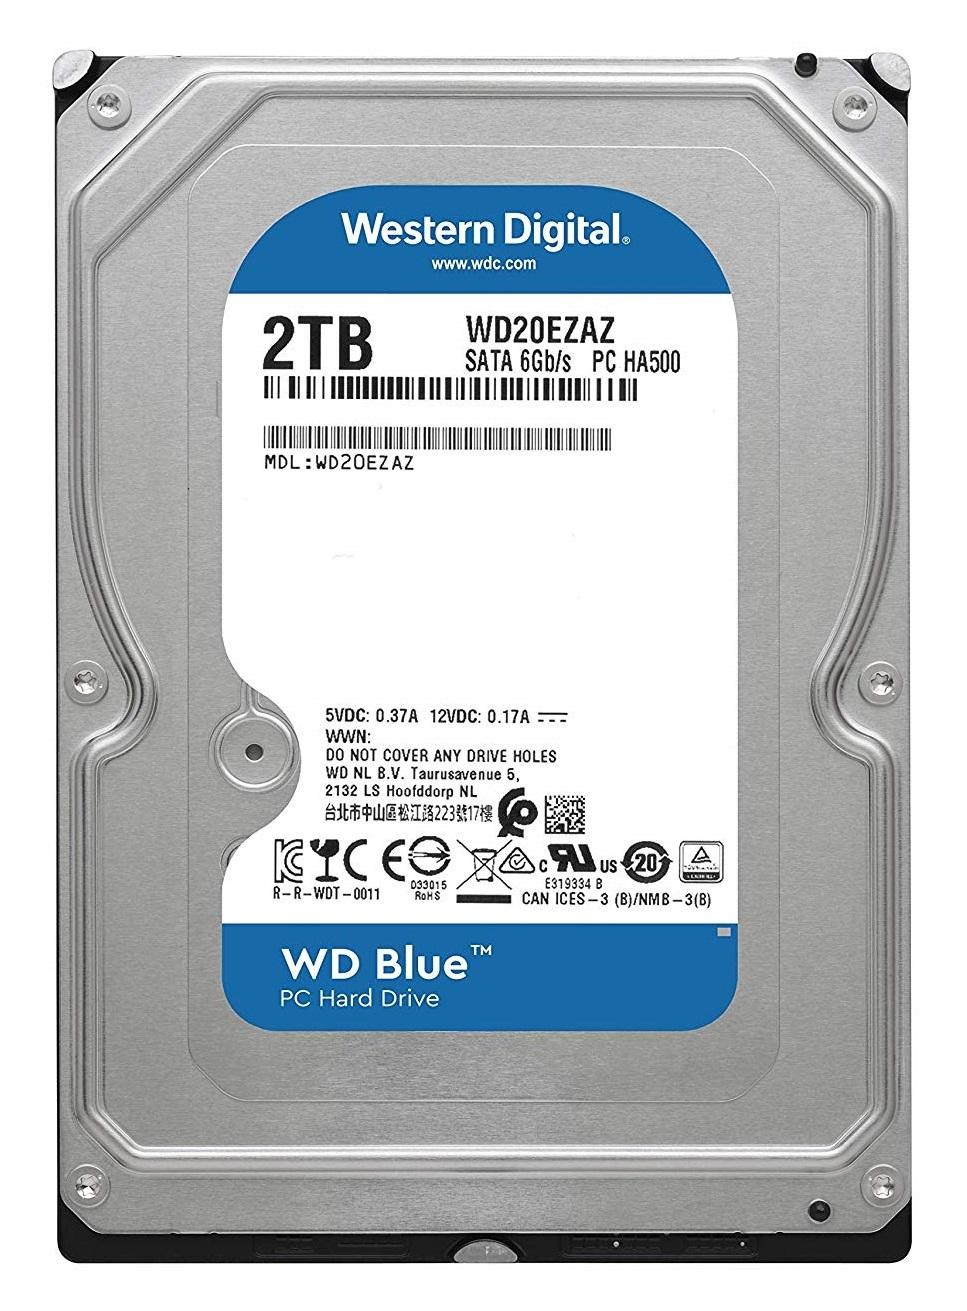 2TB WD Blue Hard Drive image